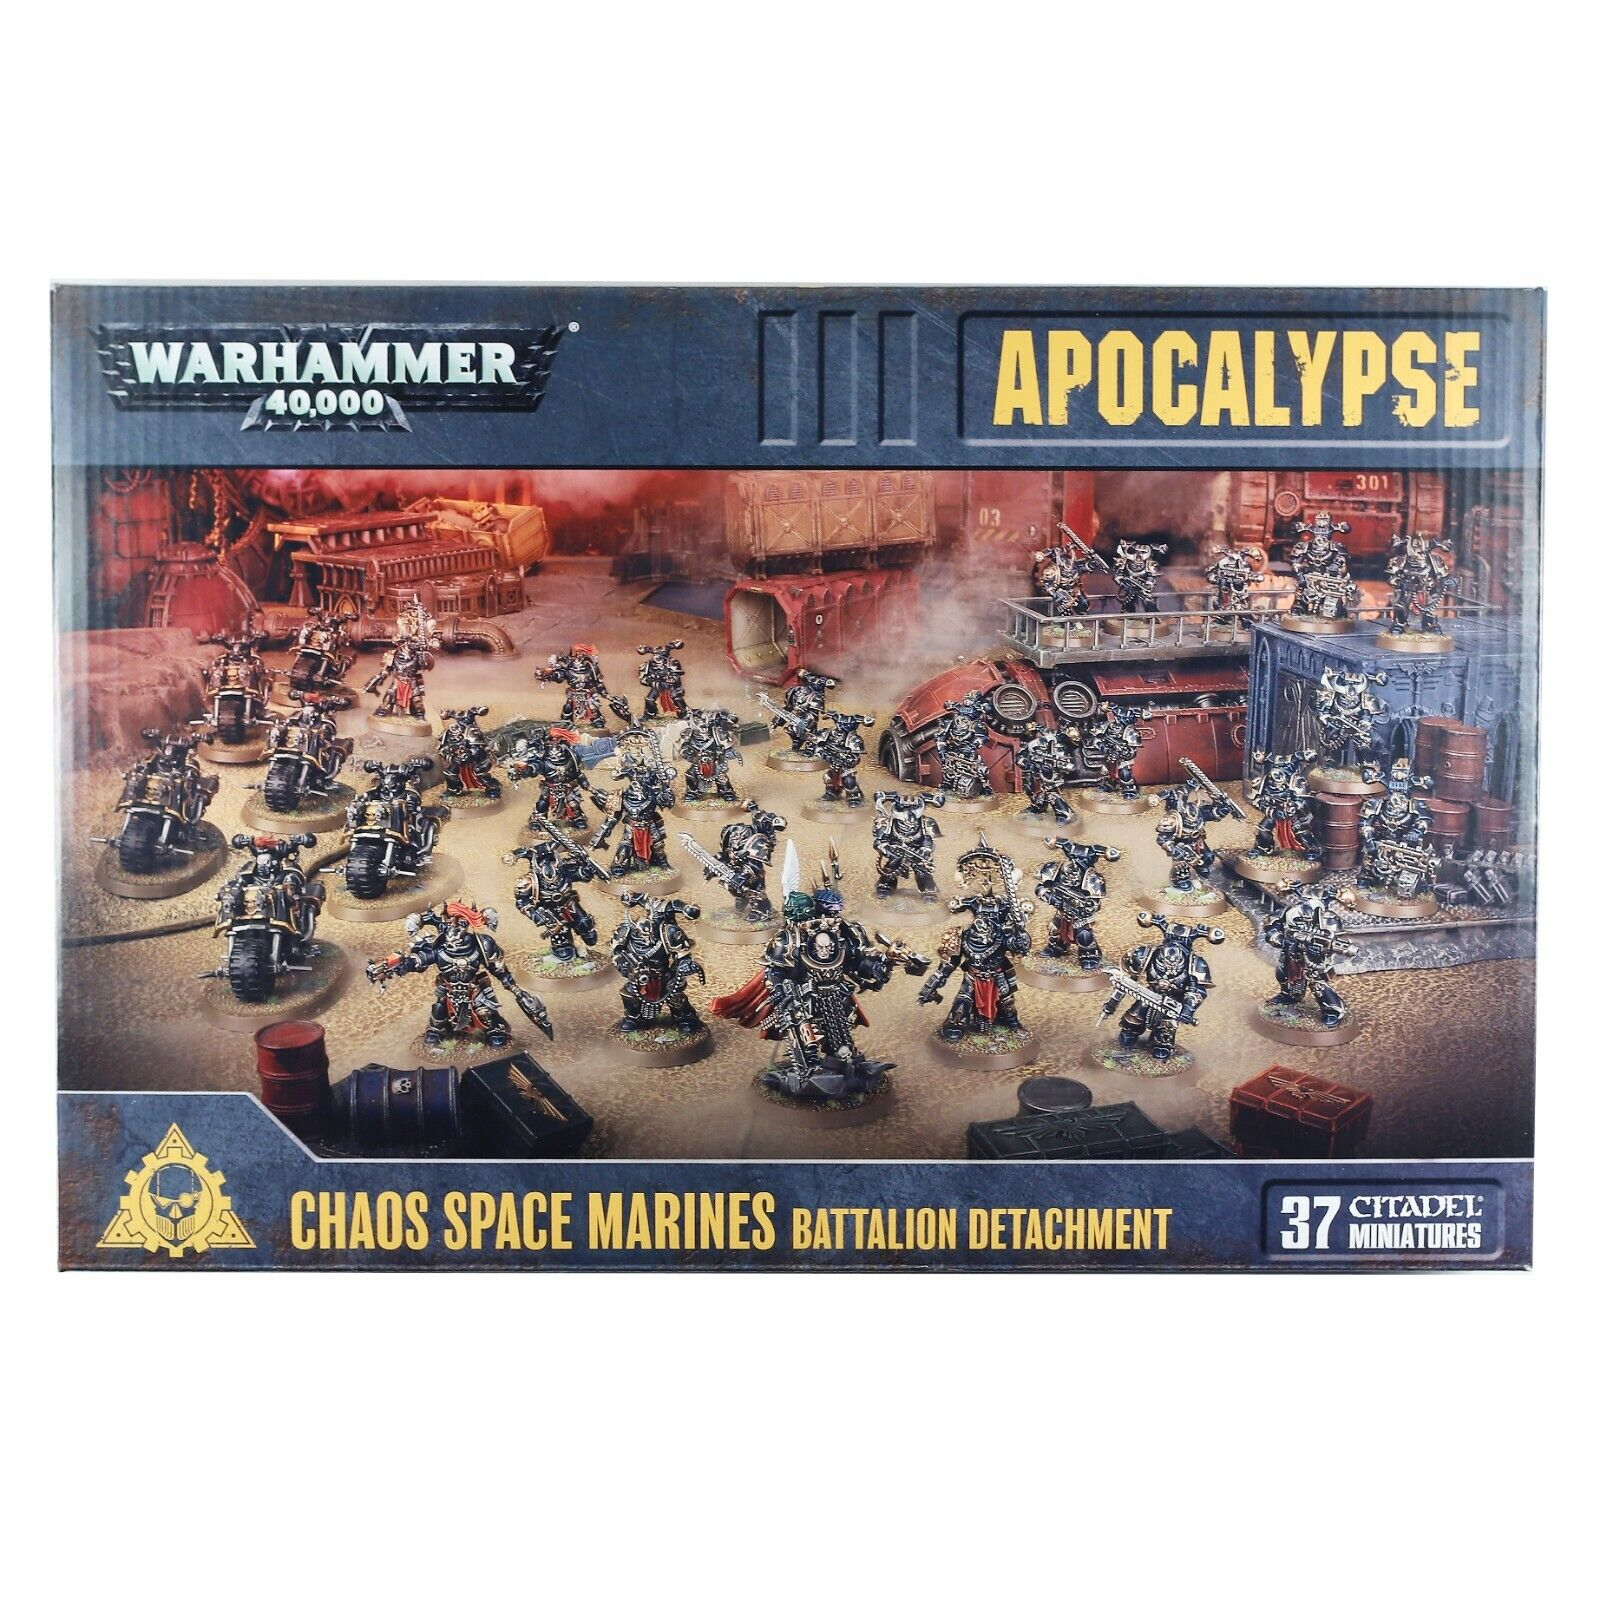 Apocalypse  Chaos Space Marines Bataillon DetachHommest Warhammer 40,000 (43-64)  magasin en ligne de sortie